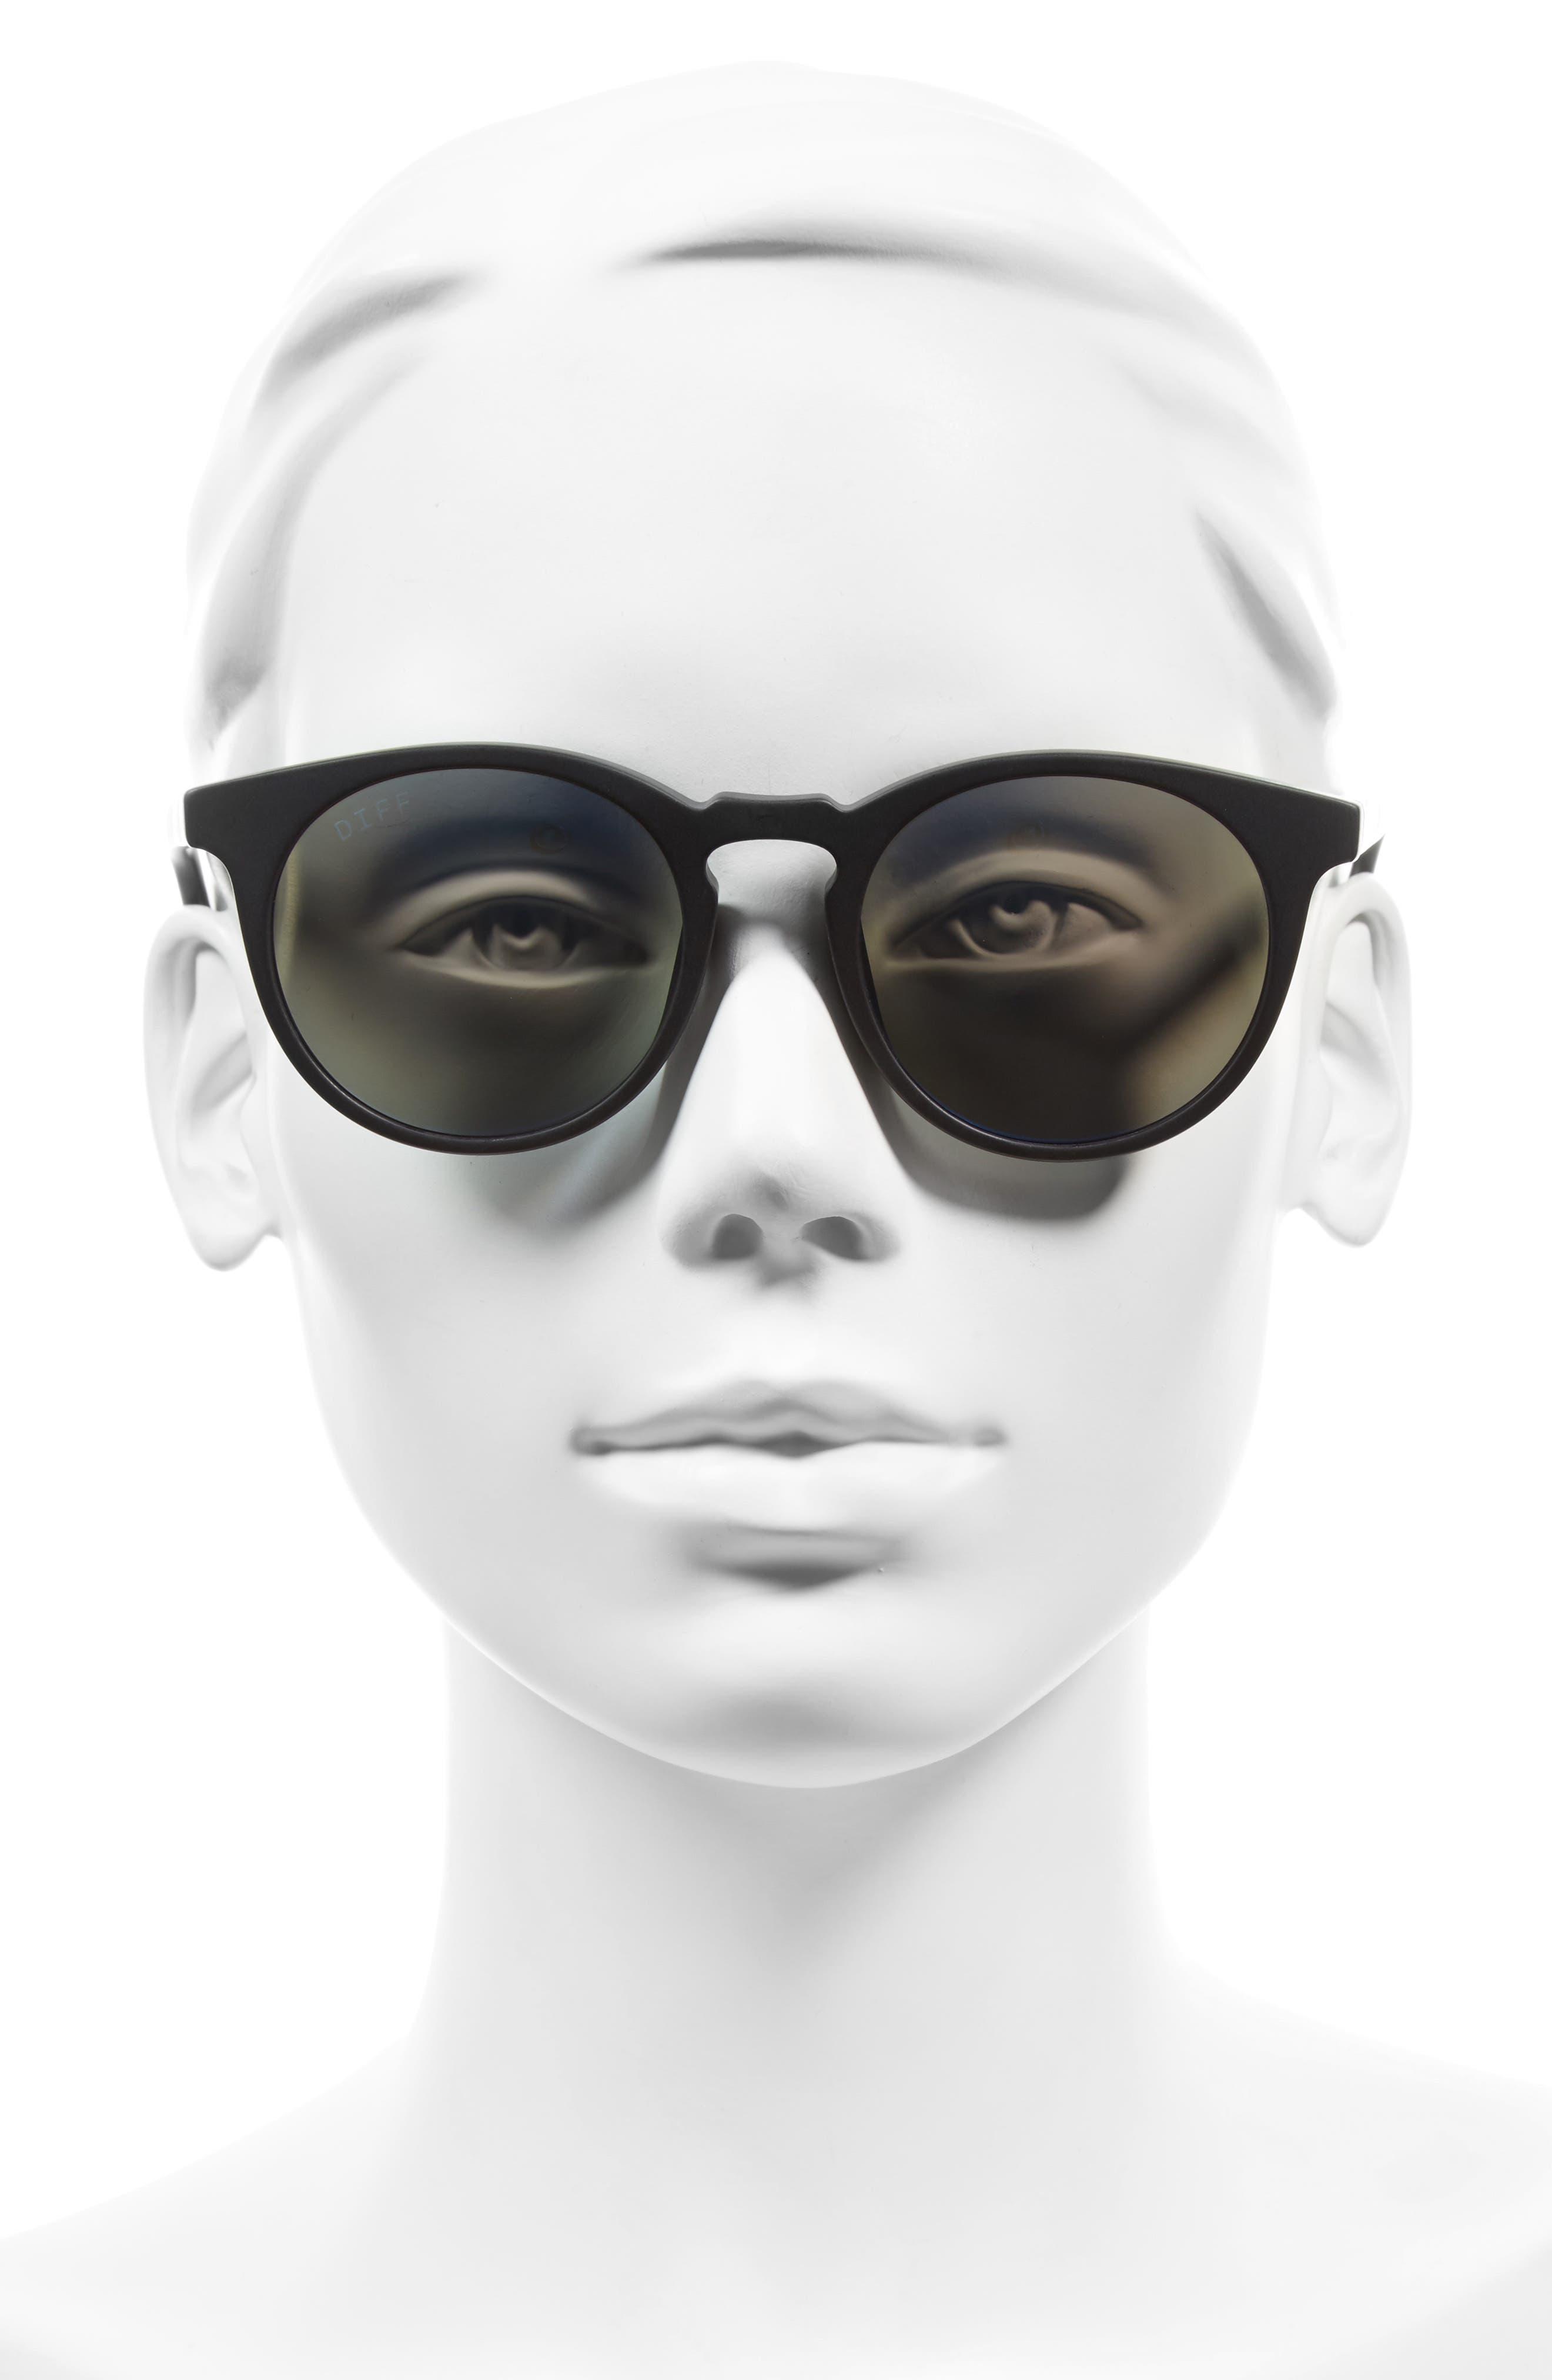 Charlie 48mm Mirrored Polarized Round Retro Sunglasses,                             Alternate thumbnail 2, color,                             001